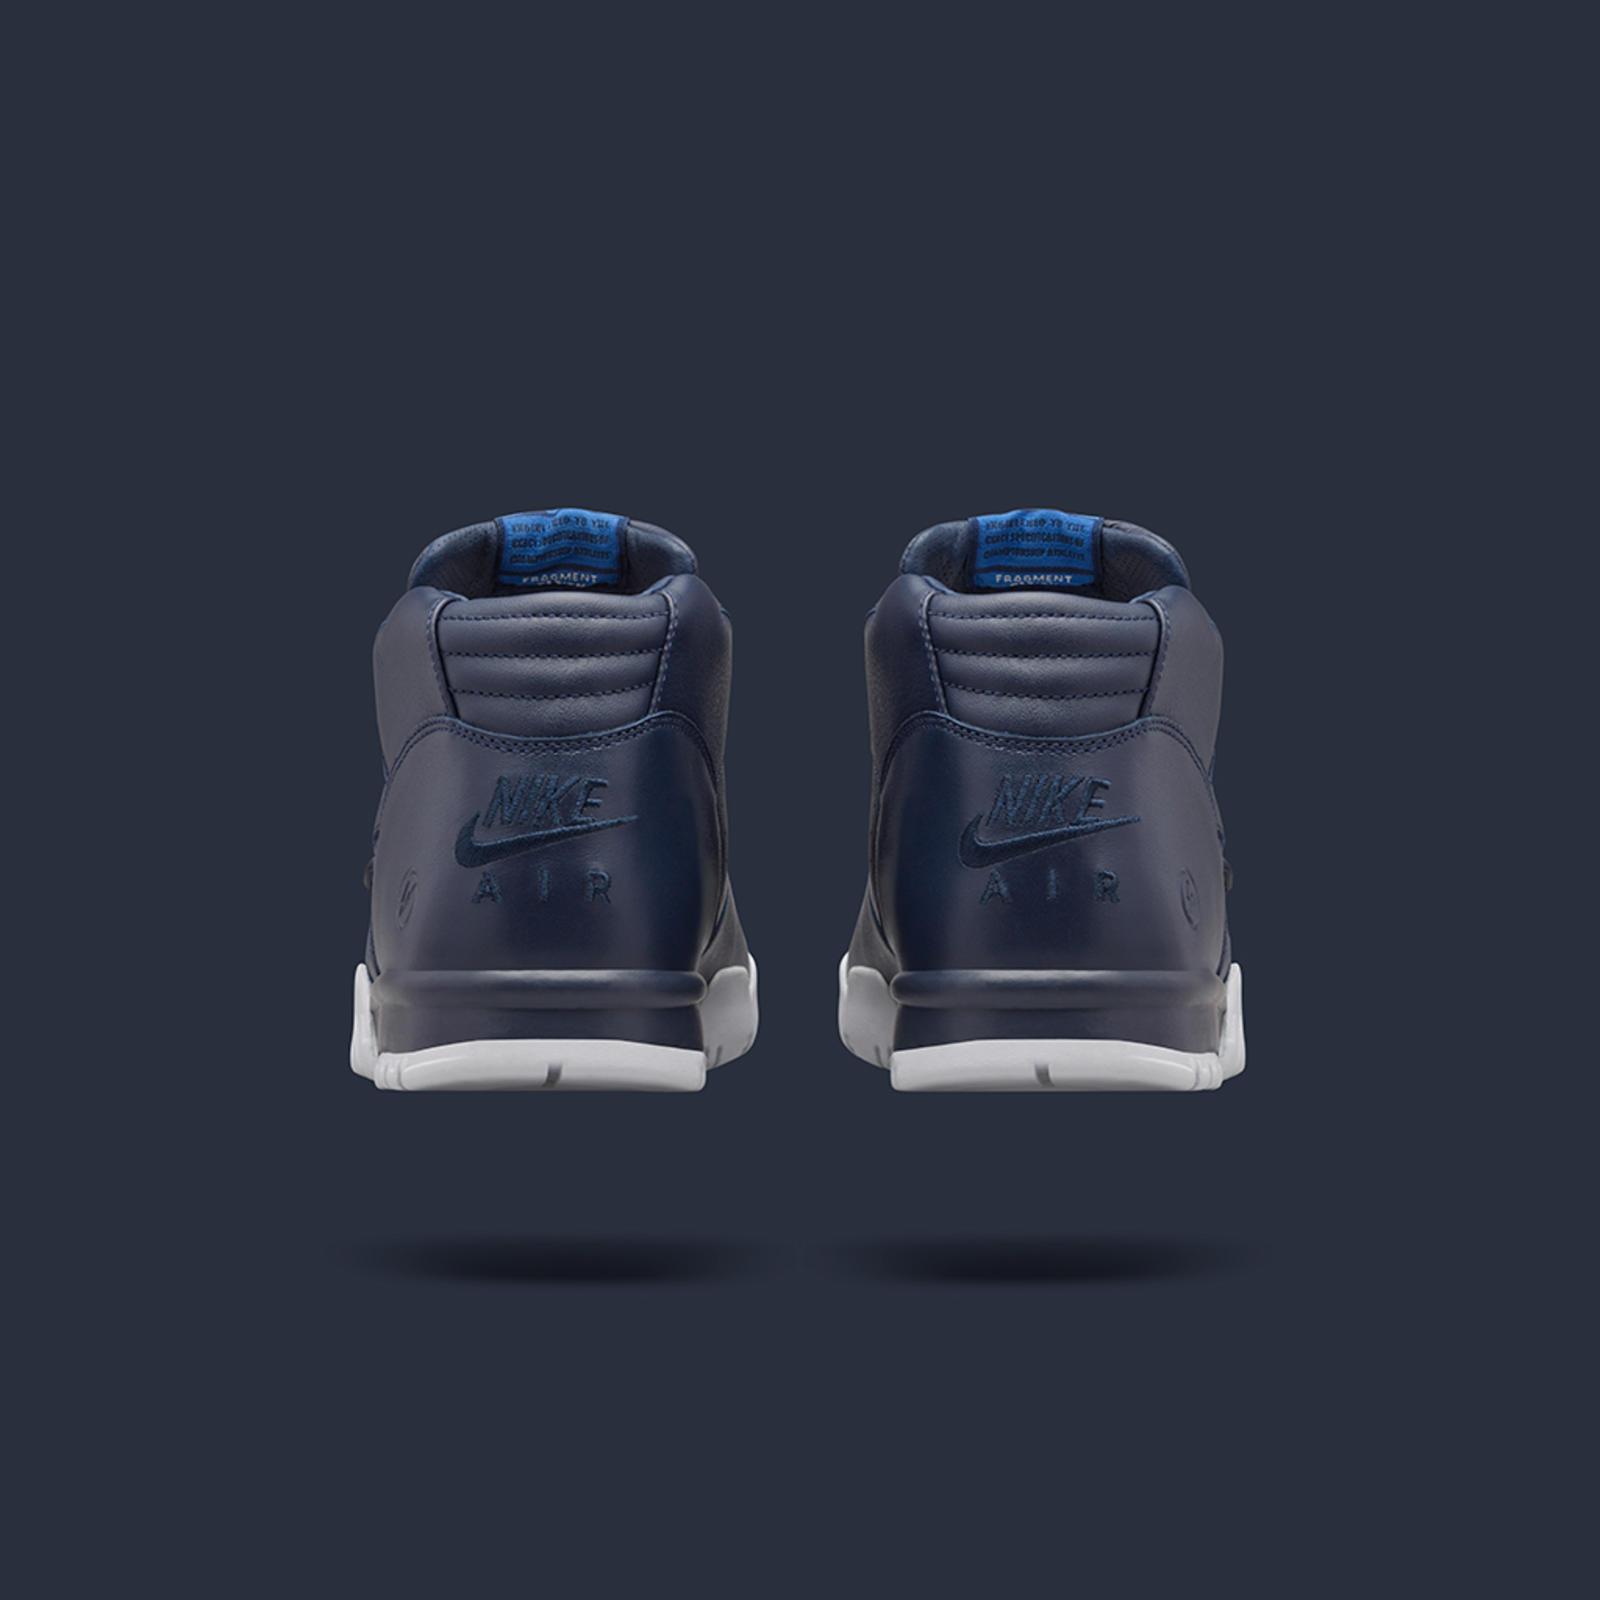 low priced 62046 03c94 ... Nike Air Trainer 1. Float-806942 441 F PREM